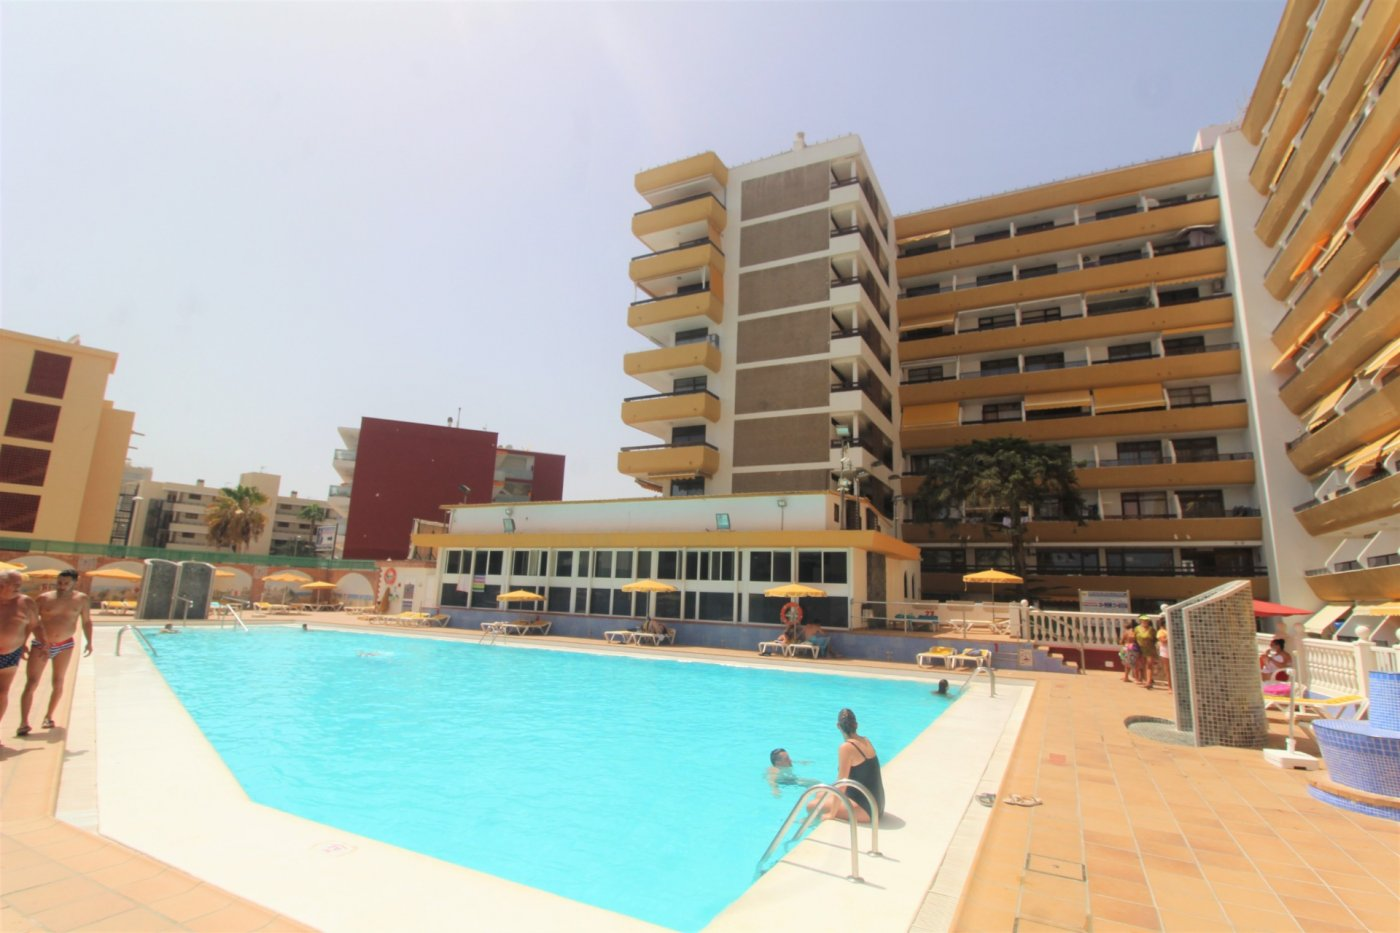 apartamento en san-bartolome-de-tirajana · playa-del-ingles 0€